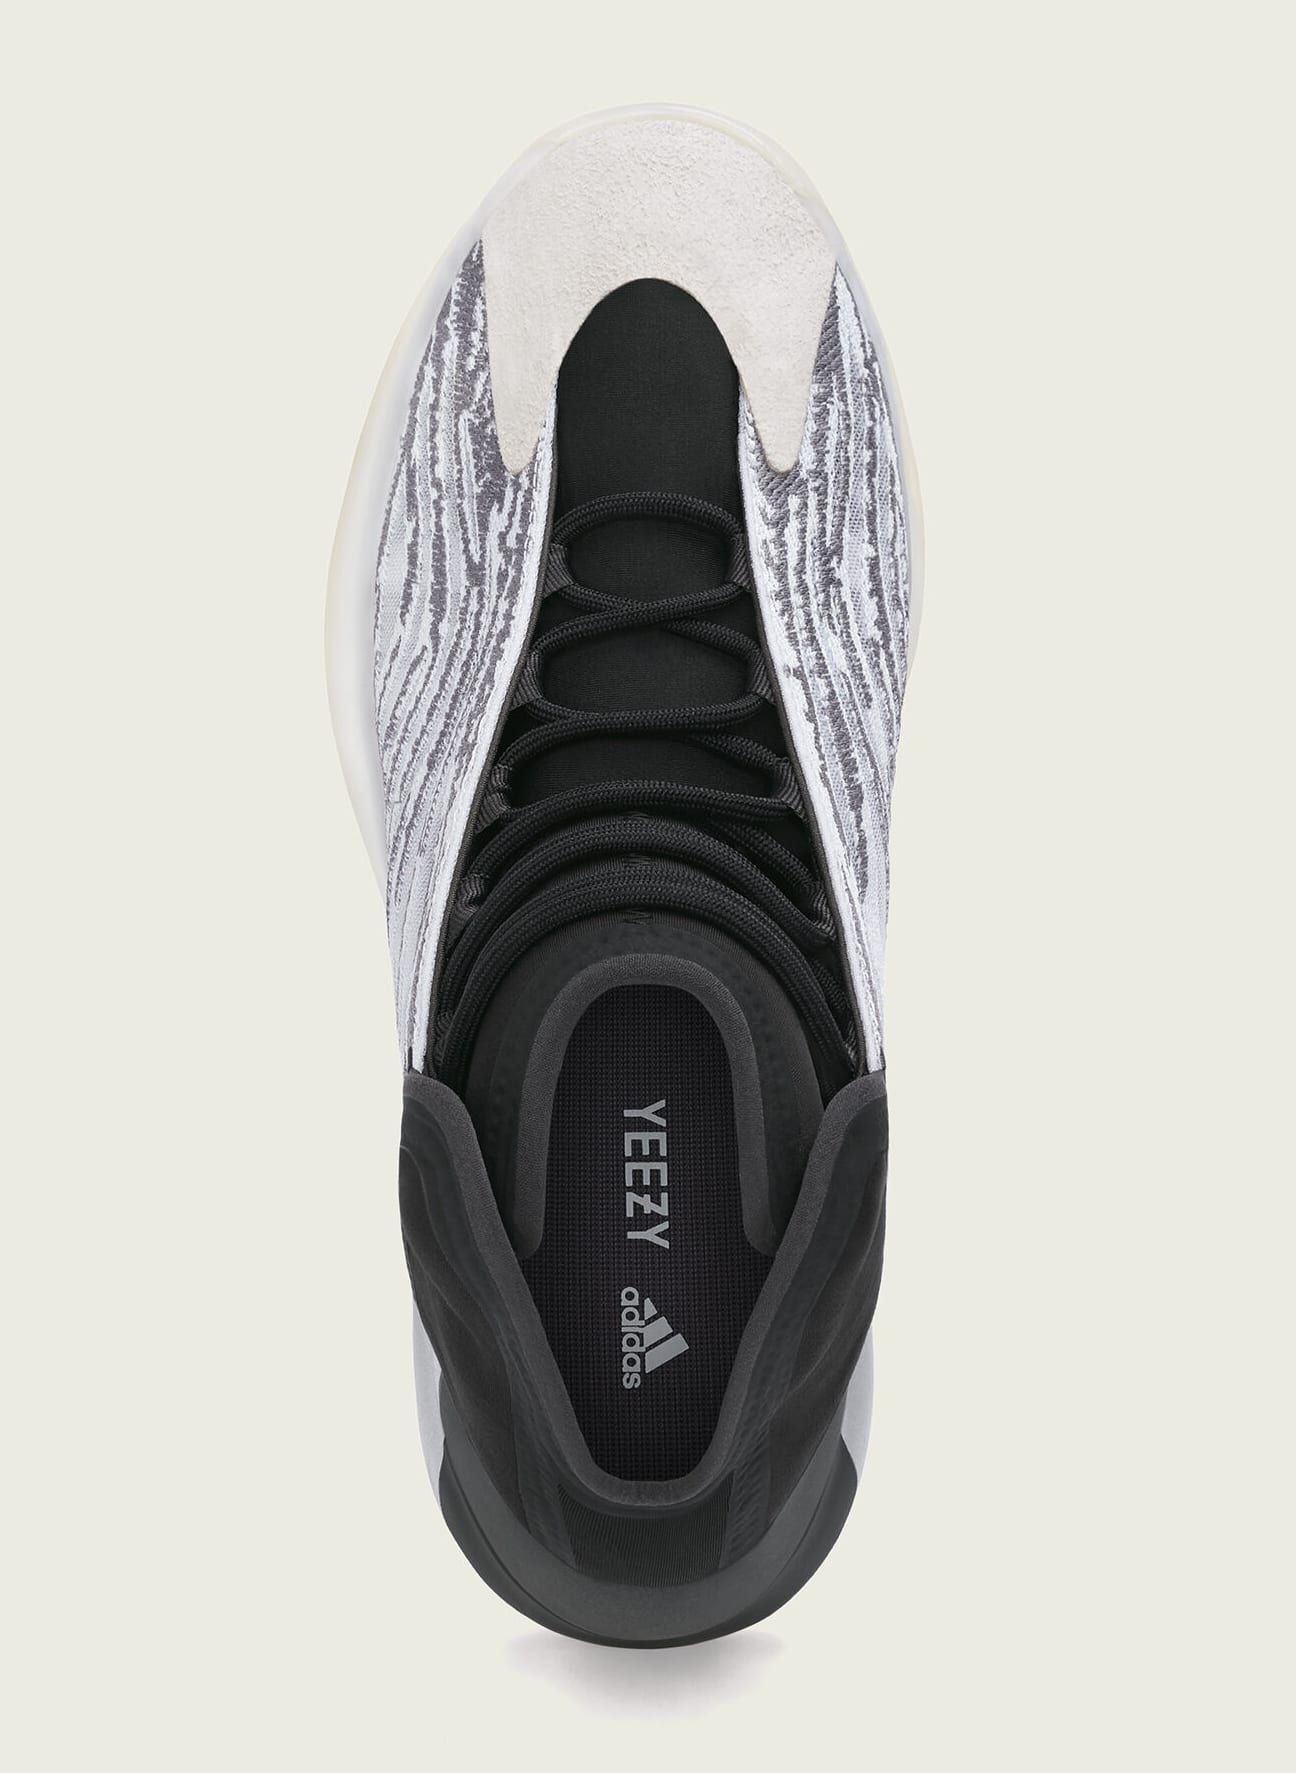 adidas-yeezy-qntm-quantum-q46473-top